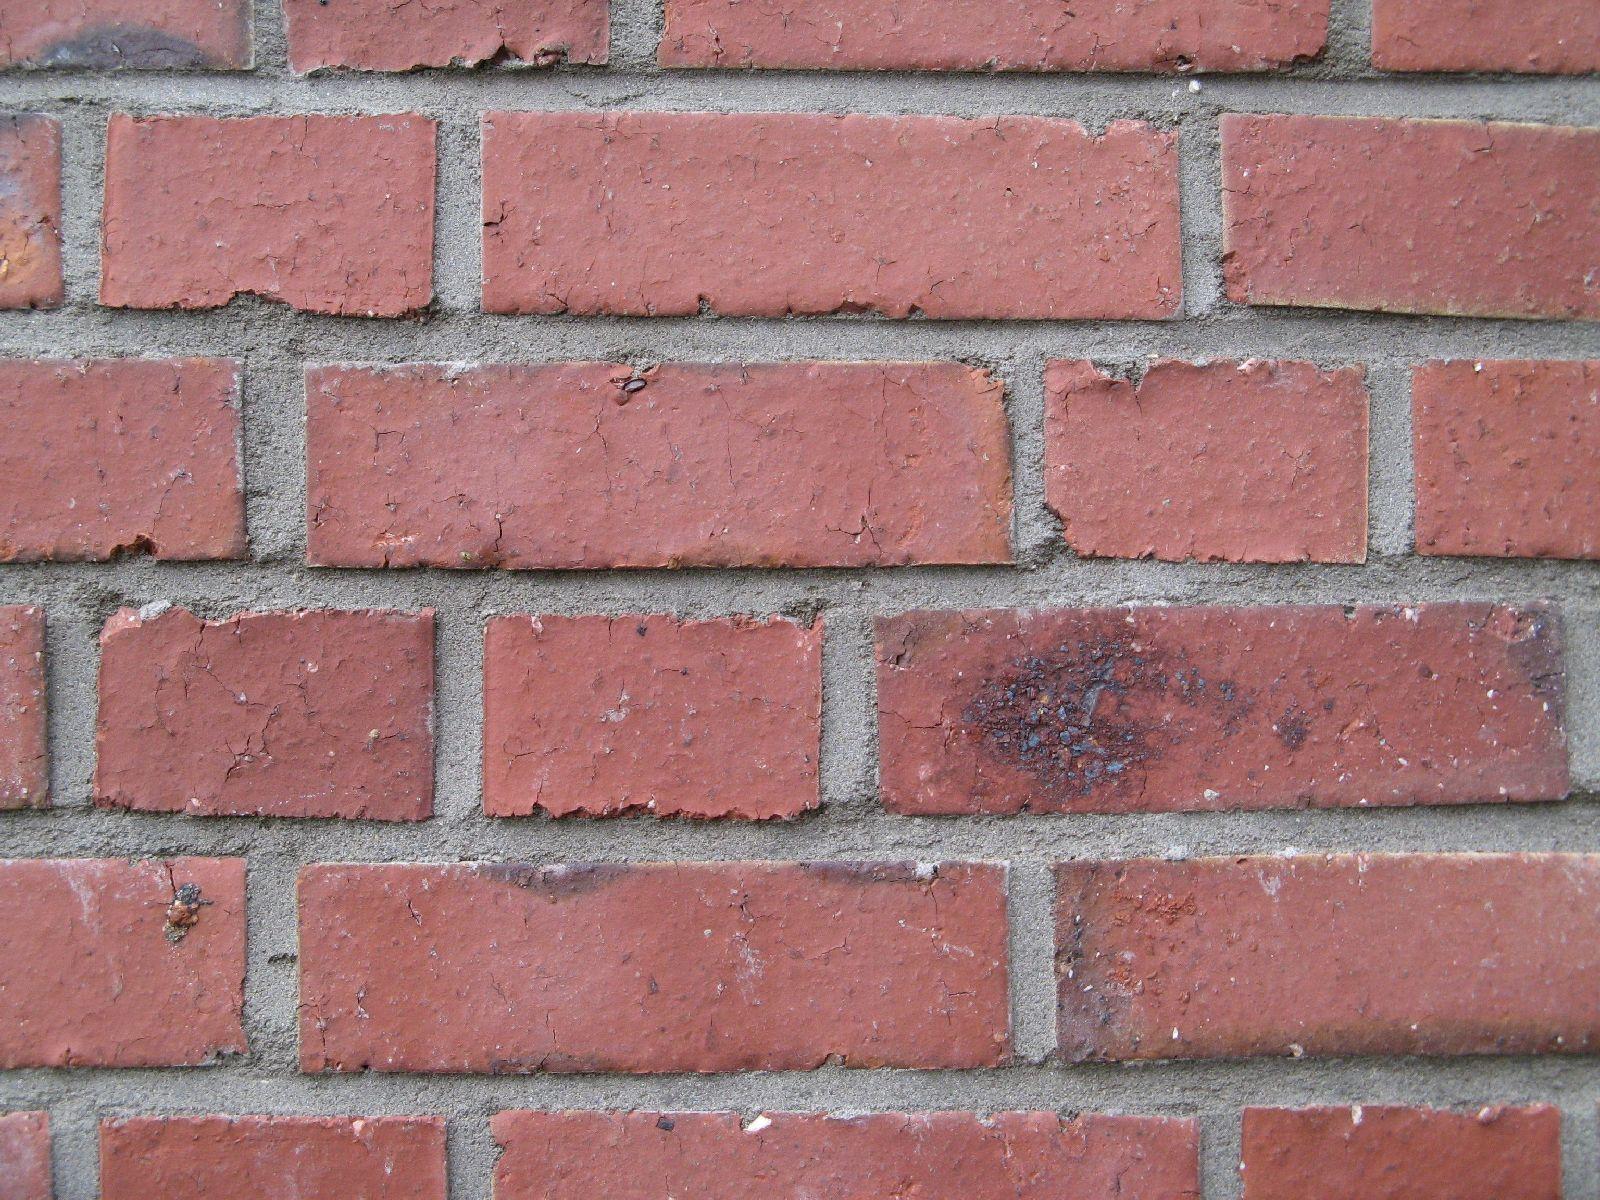 Brick_Texture_B_0904